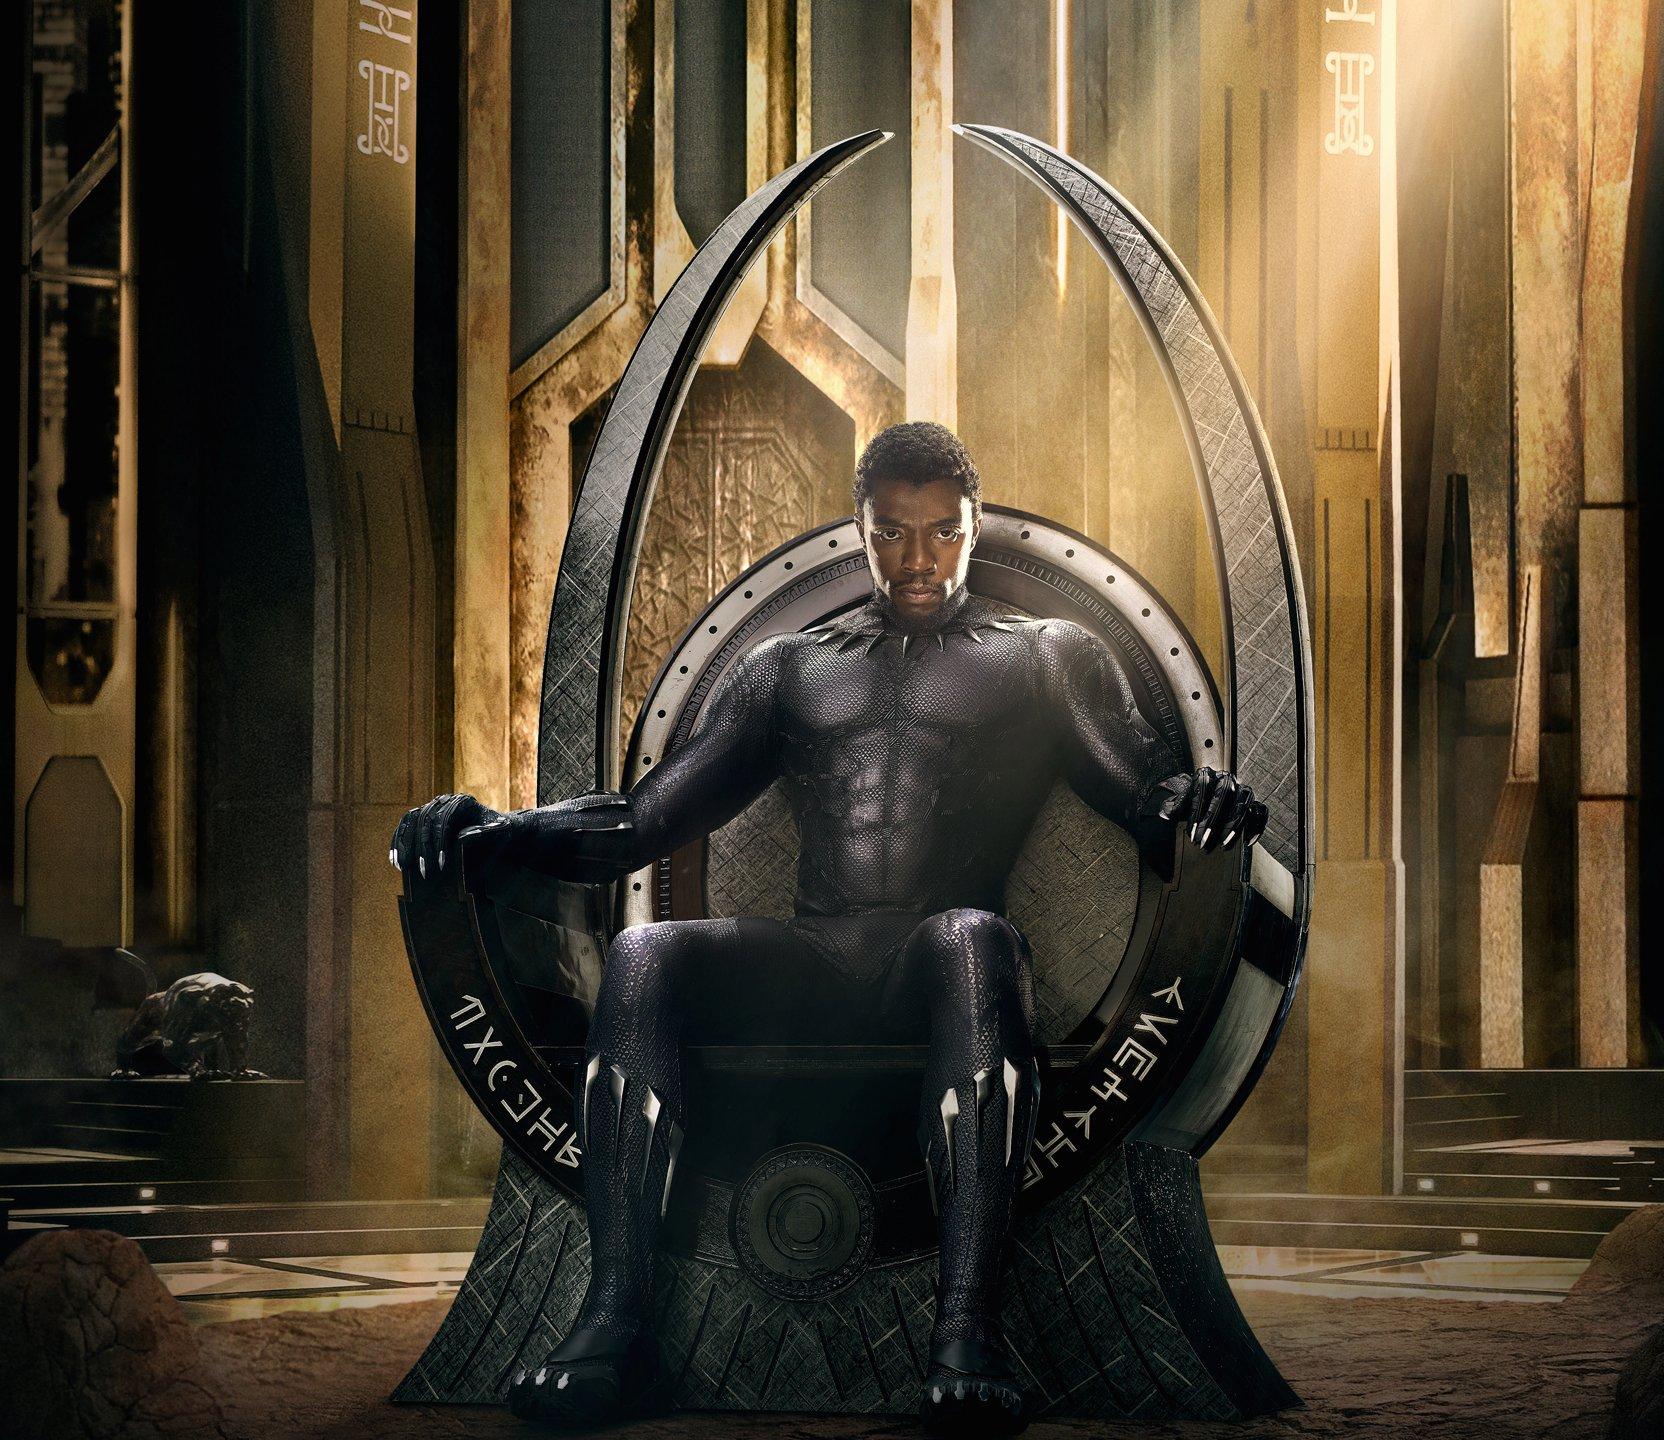 Hear a new @KendrickLamar/@VinceStaples song in the latest Black Panther trailer https://t.co/B8Zqr85EW0 https://t.co/RjxAzPKhyF